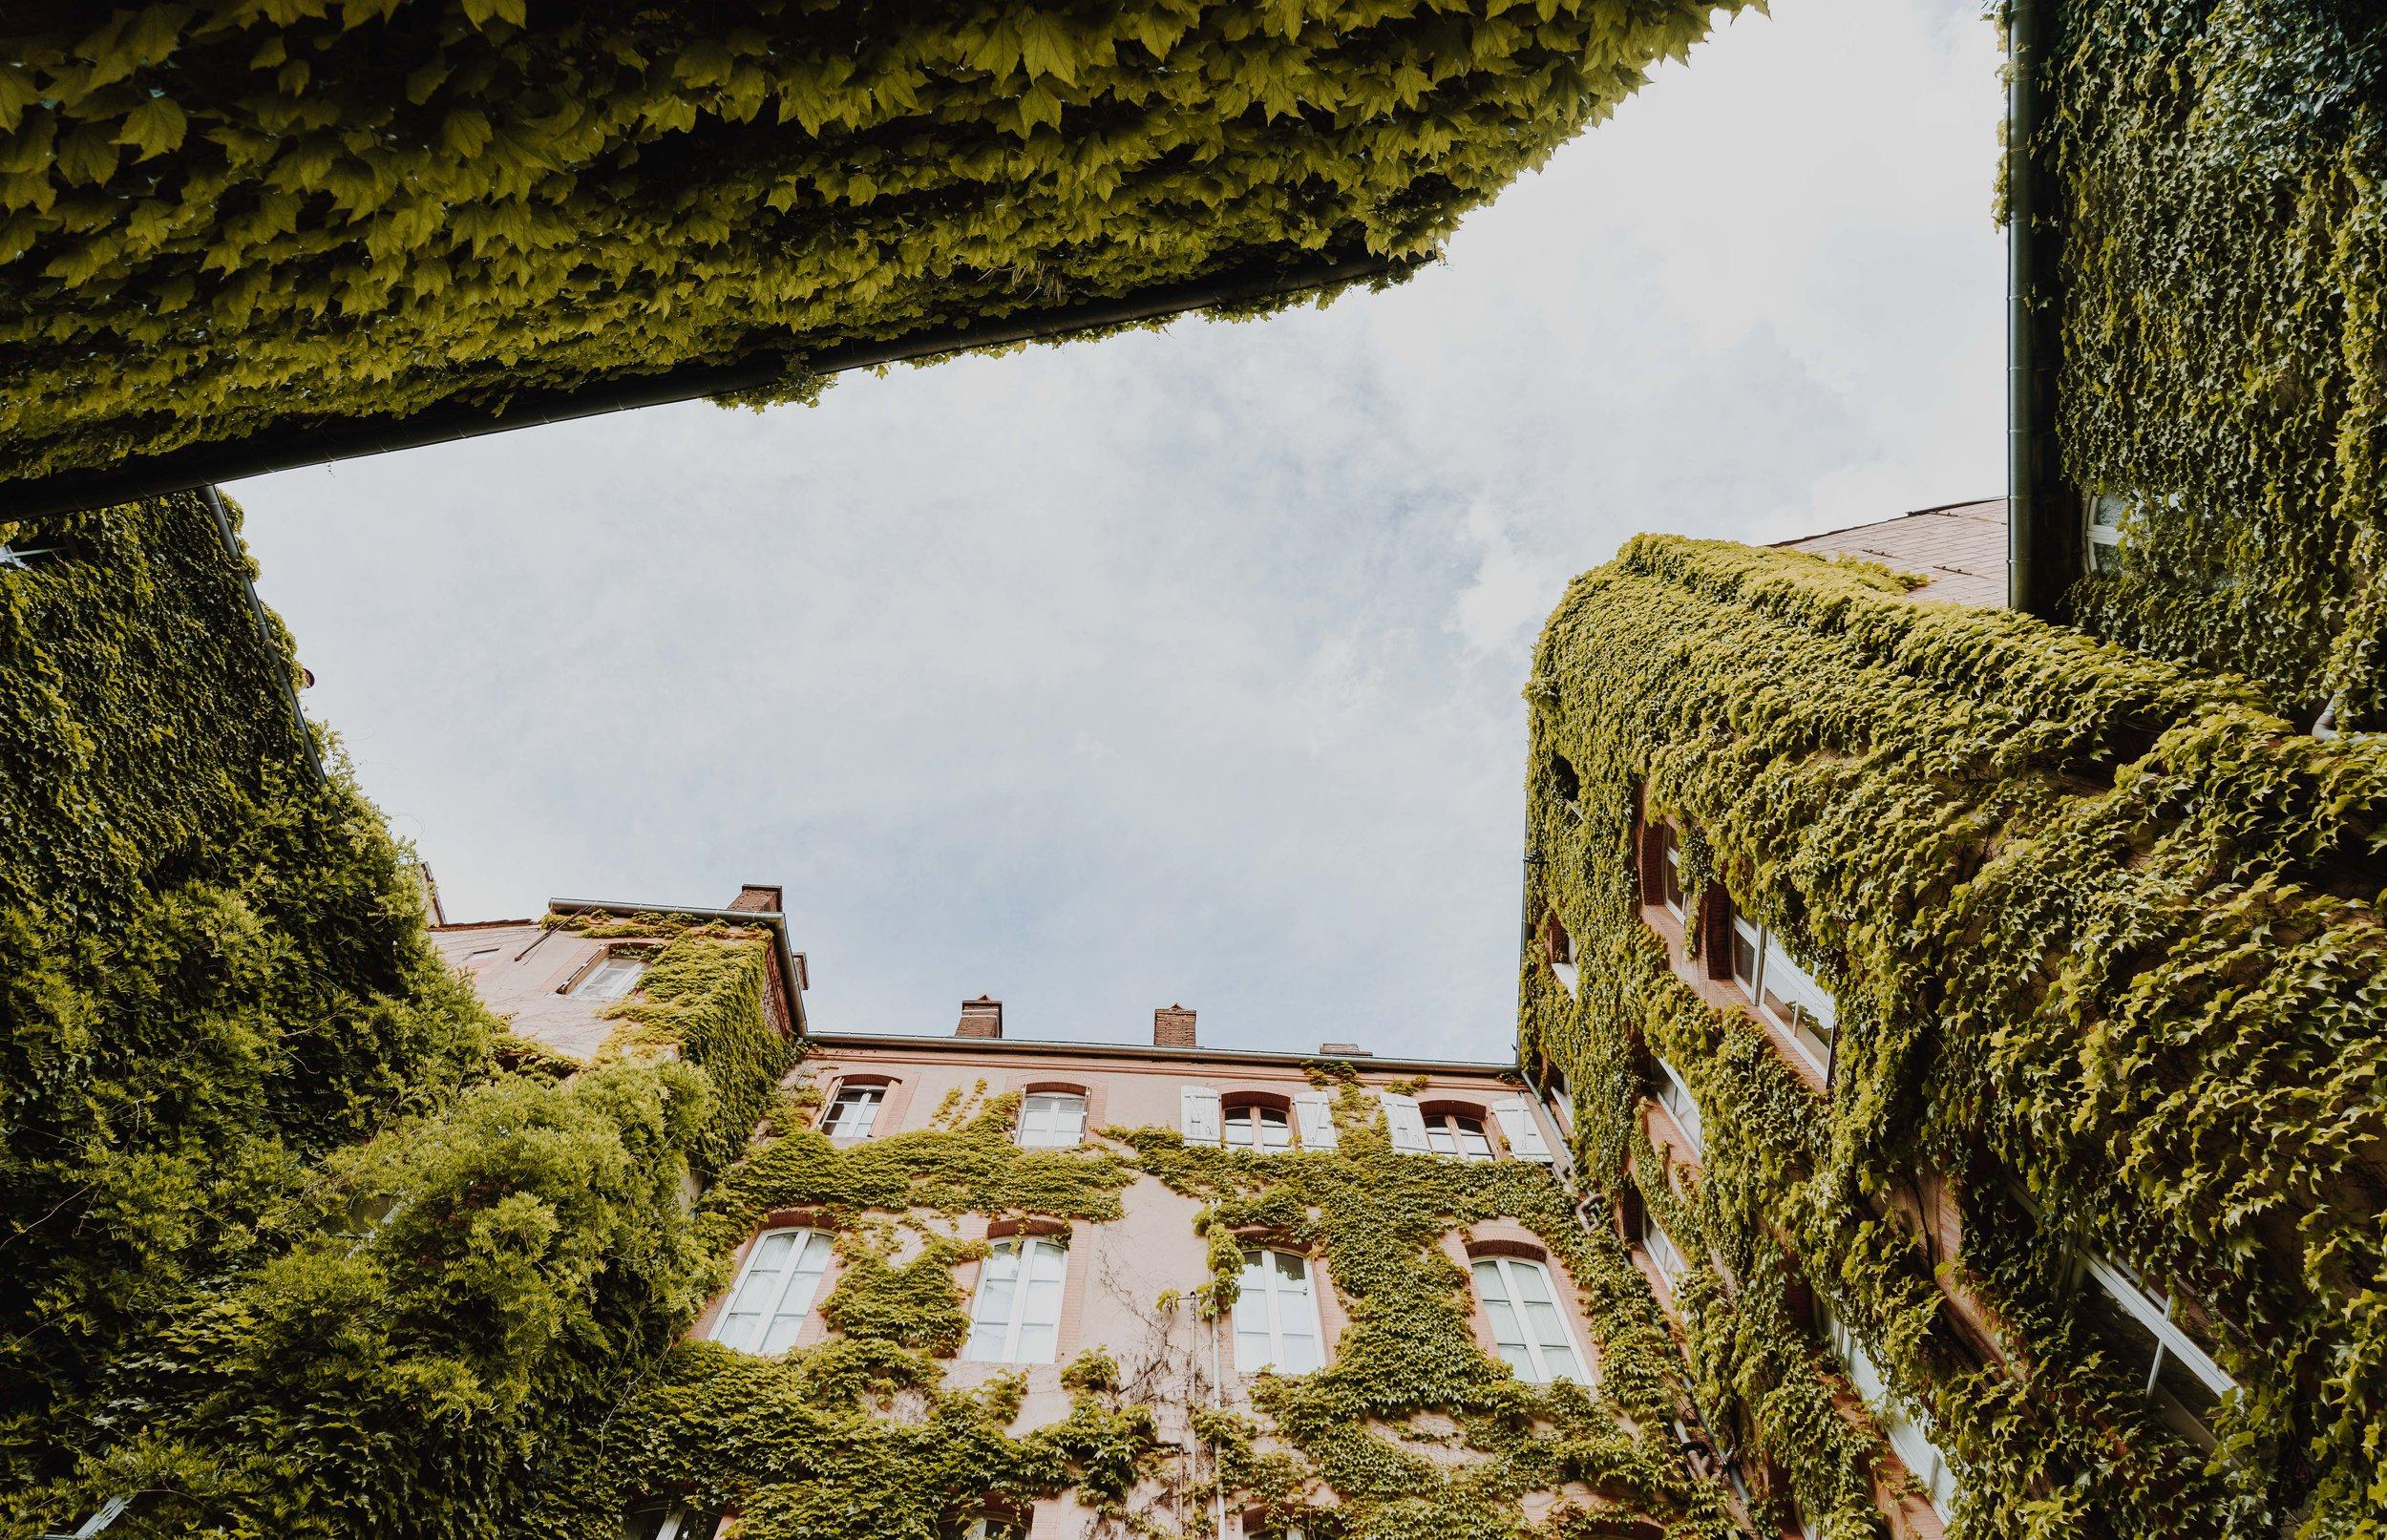 ASROSENVINGE_AtoutFrance_Toulouse_Green_Courtyard_LowRes-04782.jpg